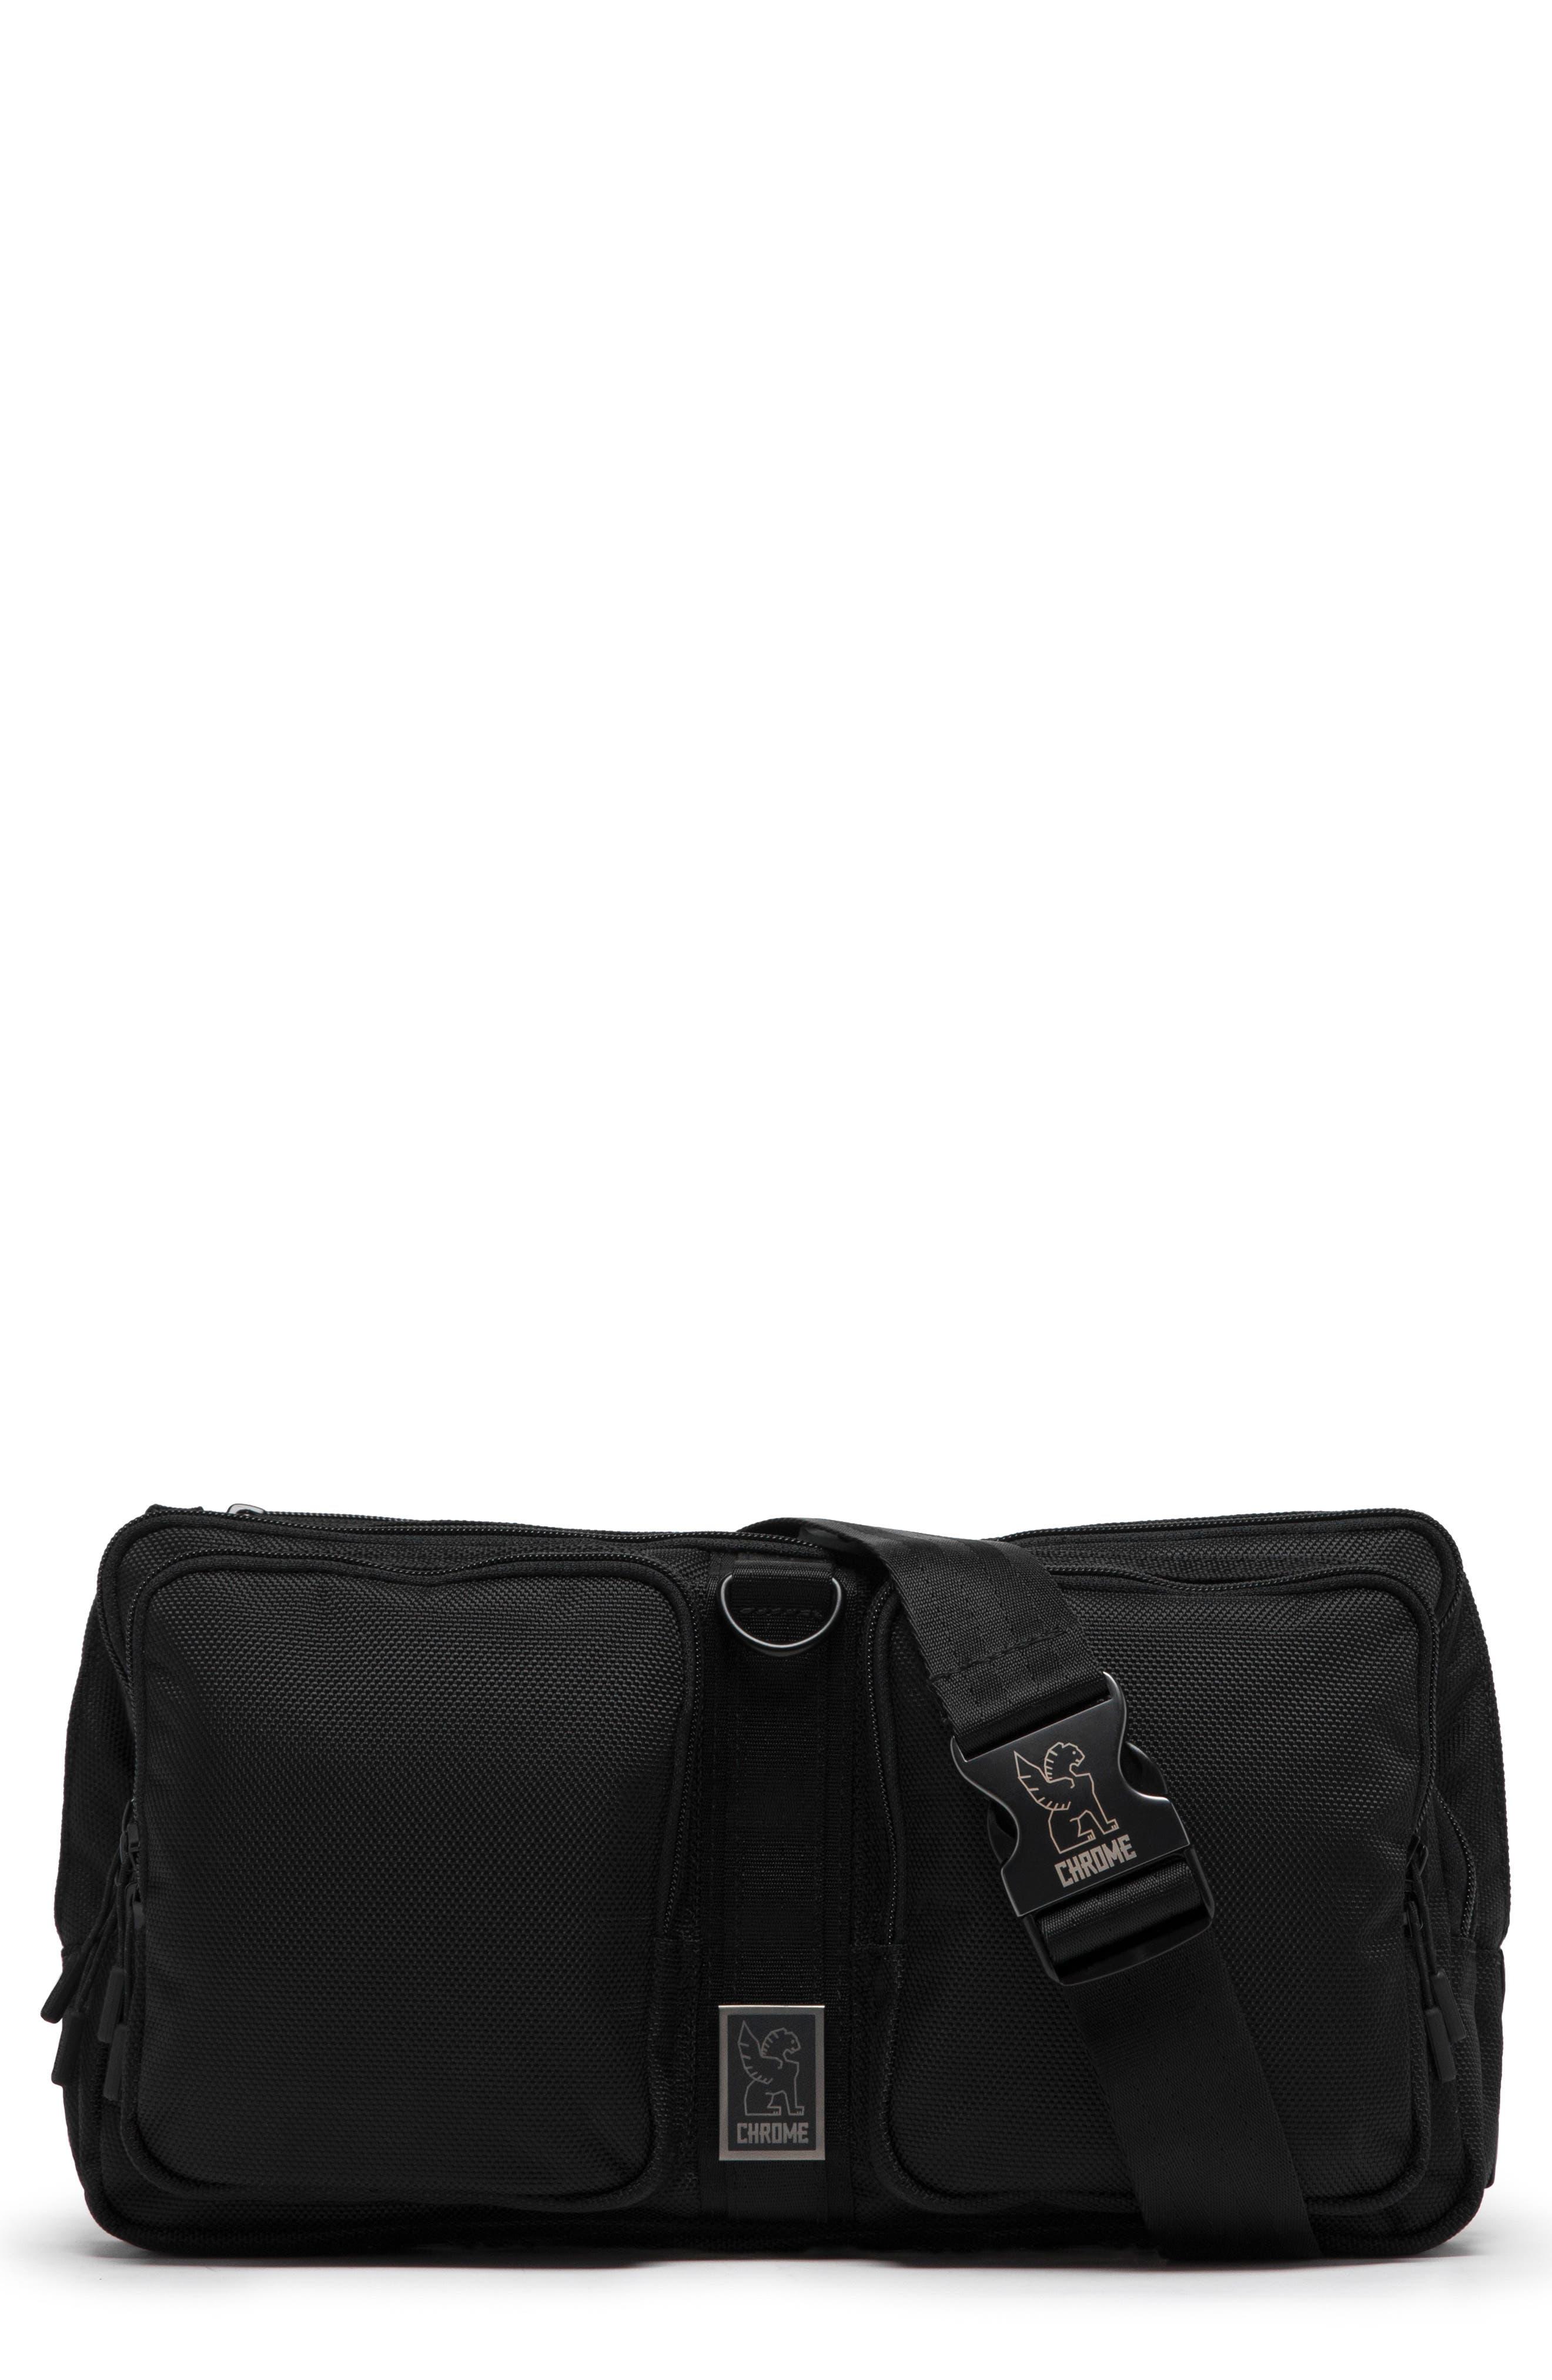 MXD Segment Sling Bag,                         Main,                         color, ALL BLACK